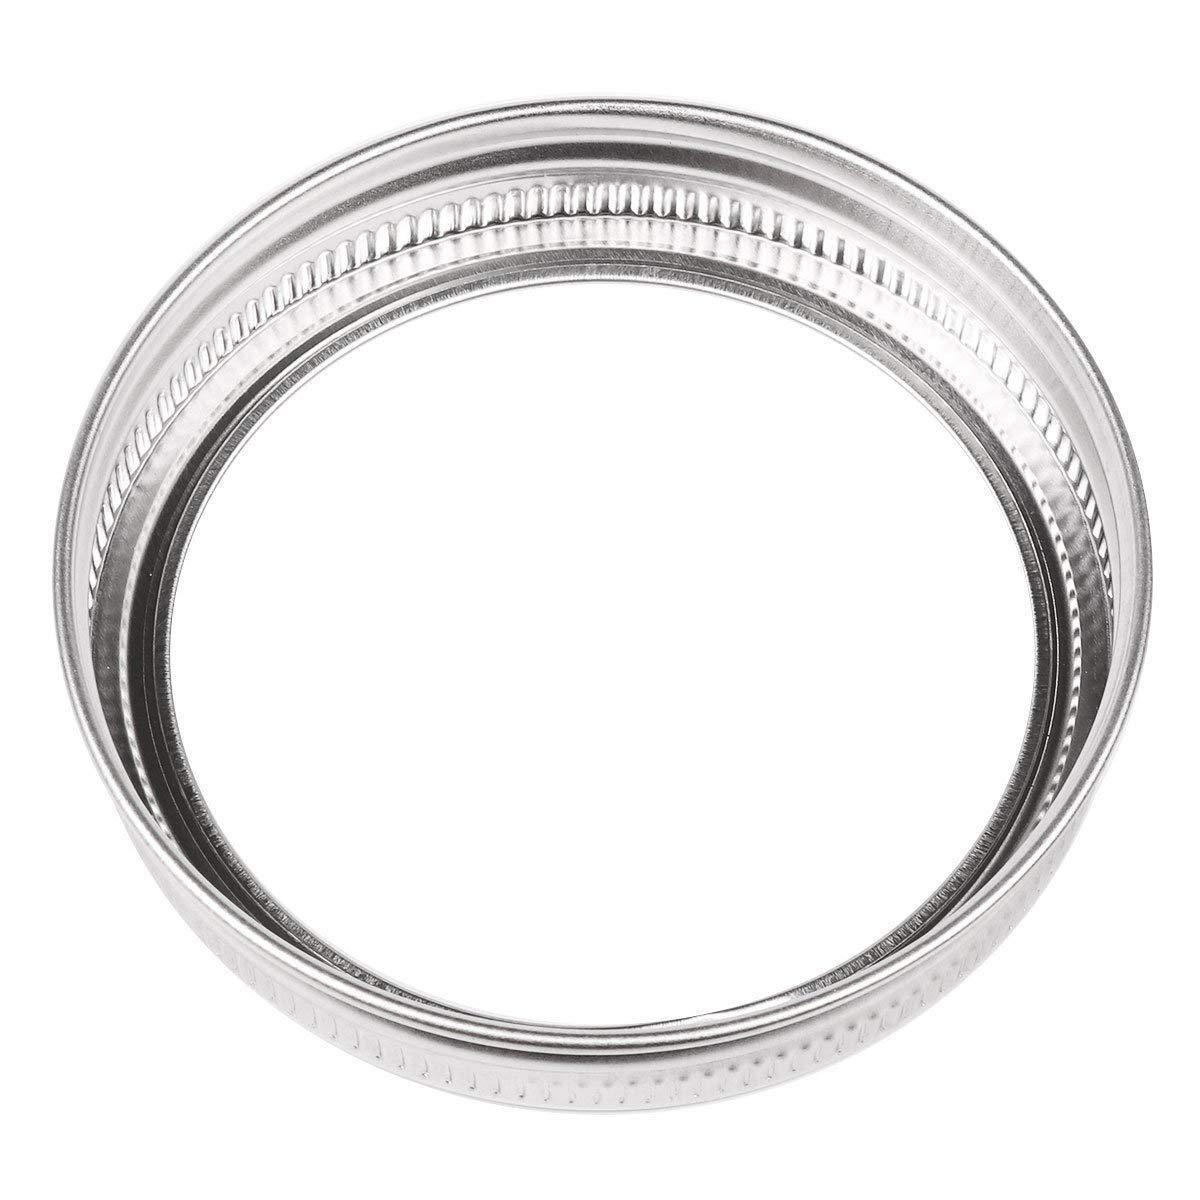 Mason Jar Replacement Rings or Tops Durable /& Rustproof Tinplate Metal Bands//Rings for Mason Jar Set of 10 wide mouth Canning Jars,Storage Ball Jar